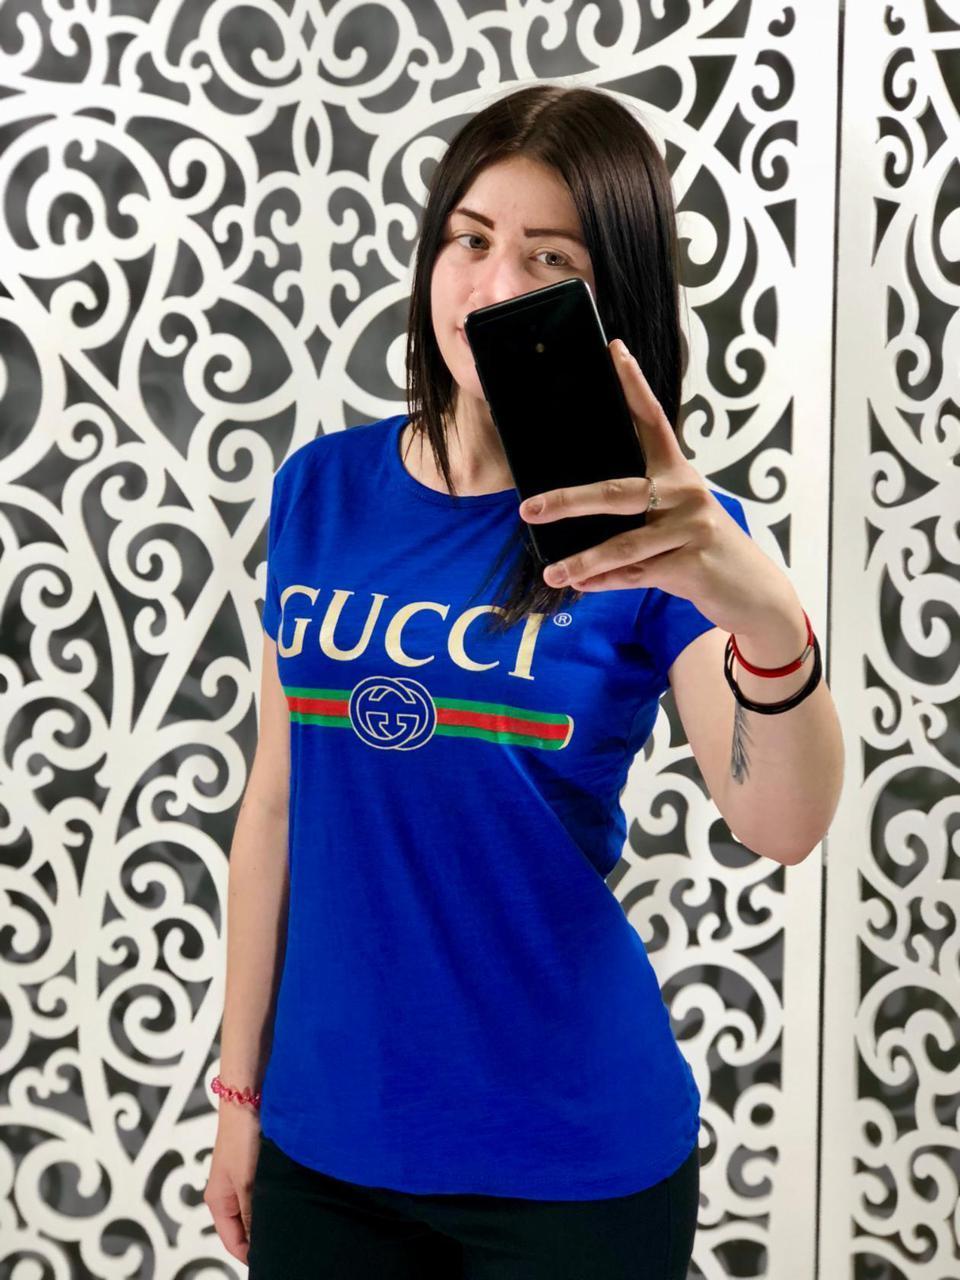 Женская футболка в стиле Gucci электрик 44, 46, 48 размер норма